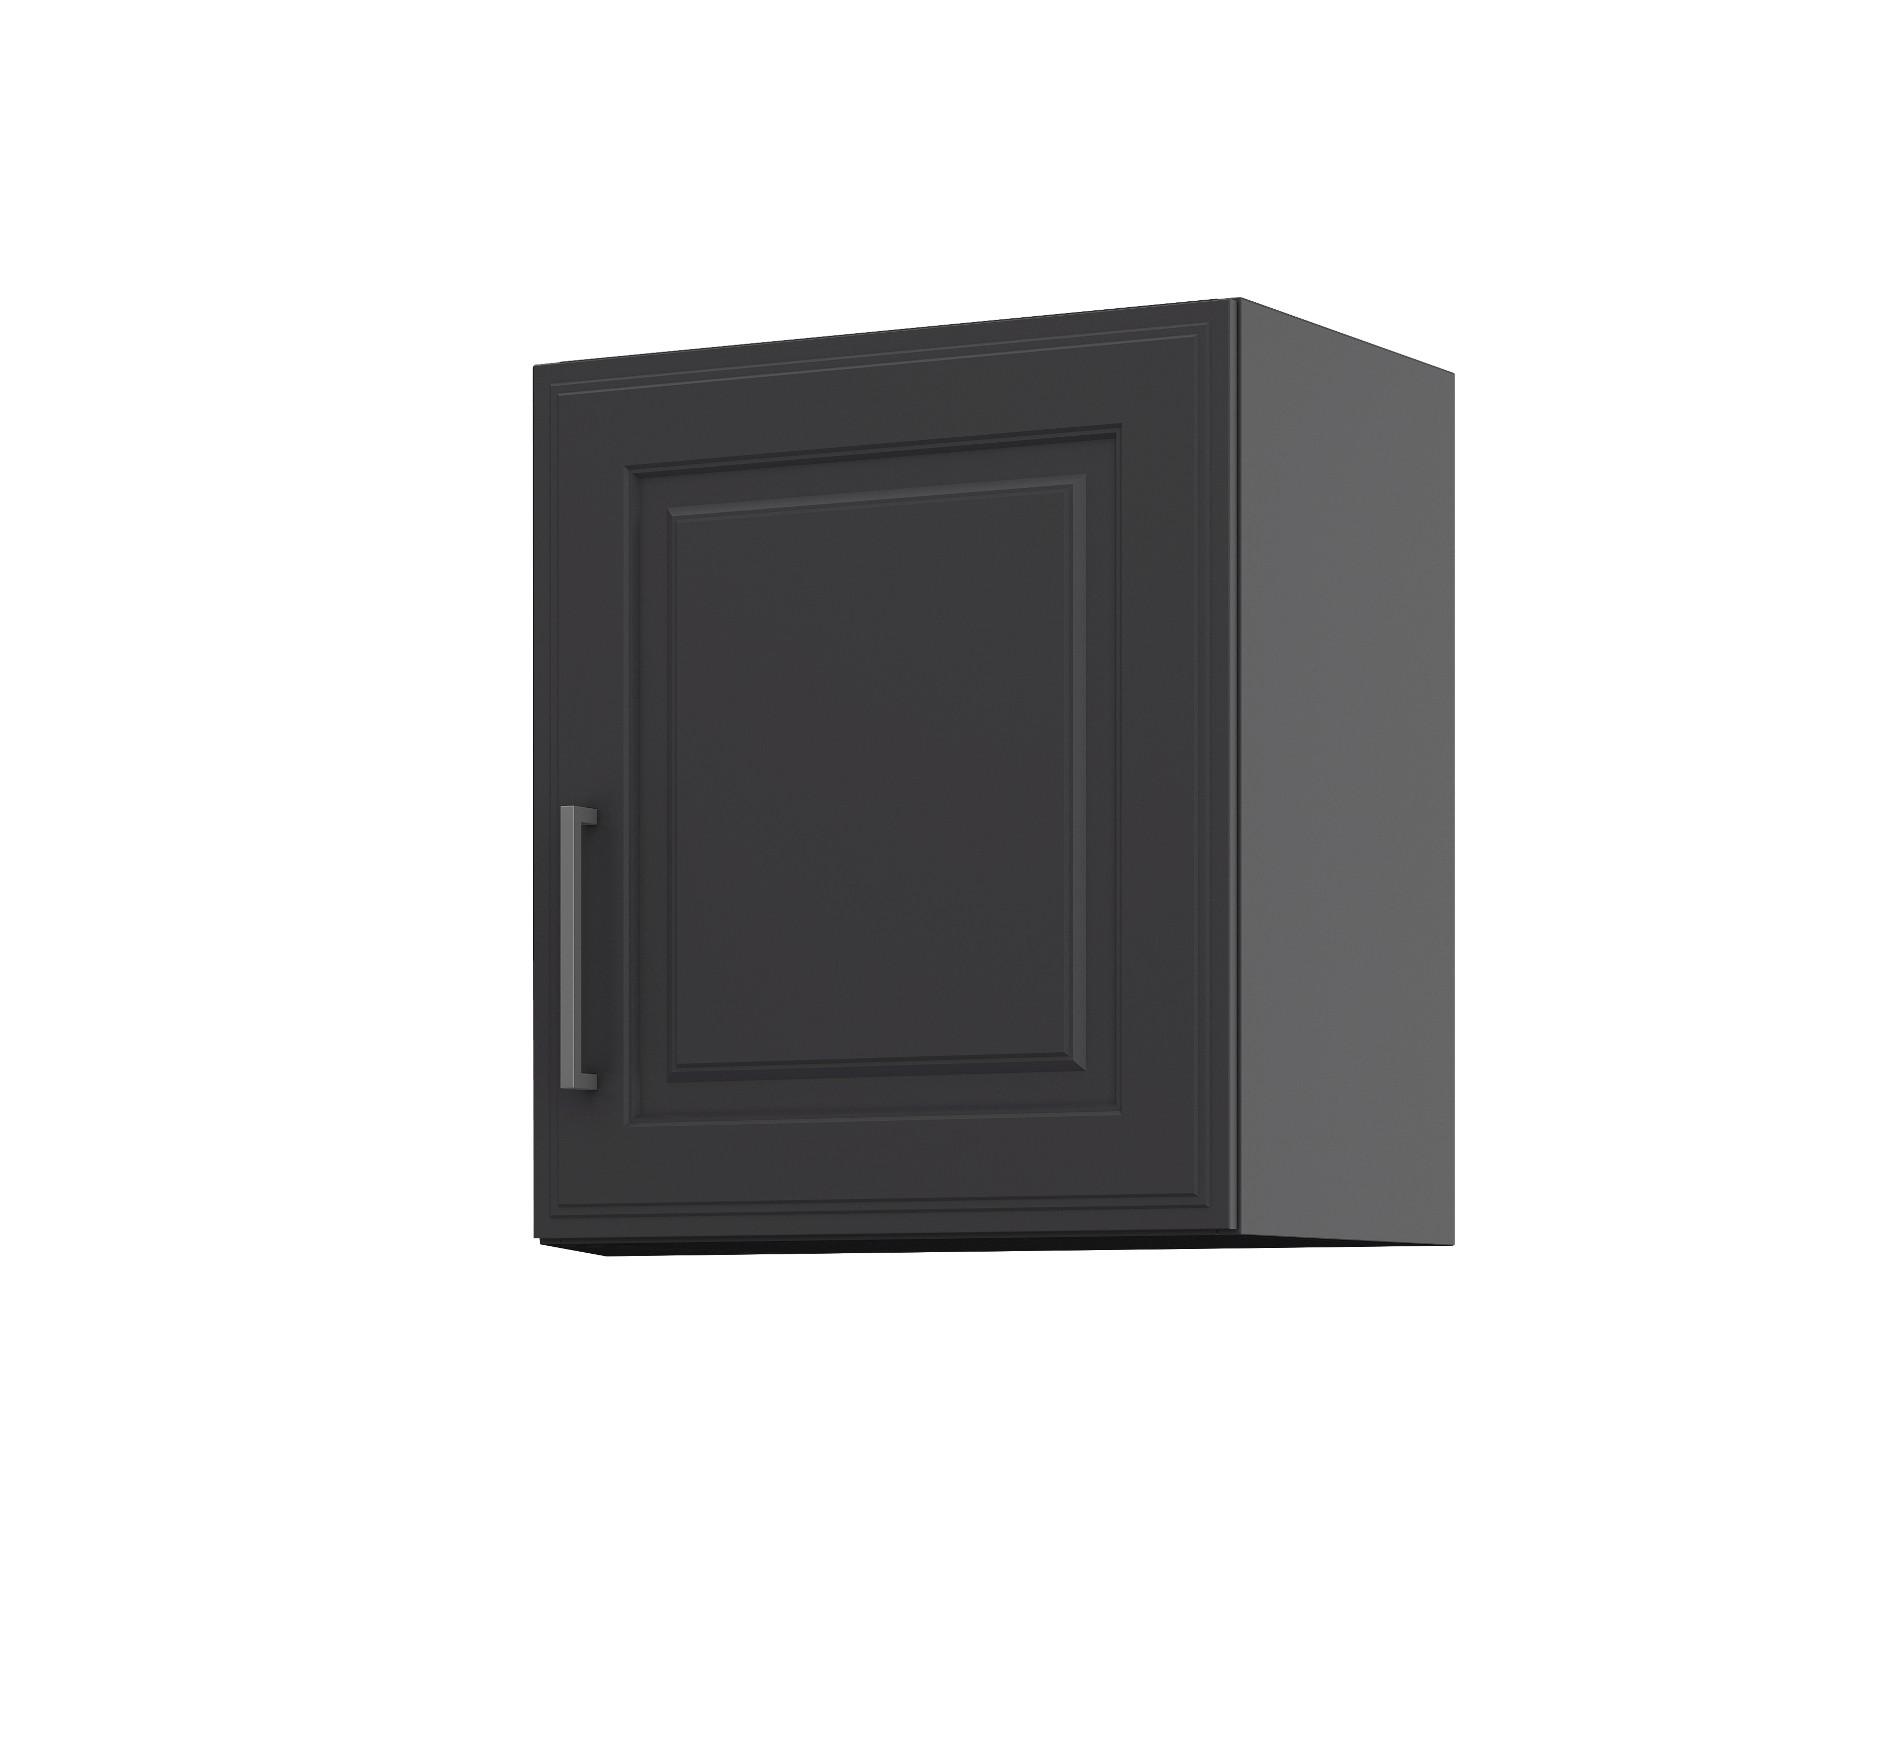 k chen h ngeschrank k ln 1 t rig breite 50 cm grau graphit k che k ln. Black Bedroom Furniture Sets. Home Design Ideas